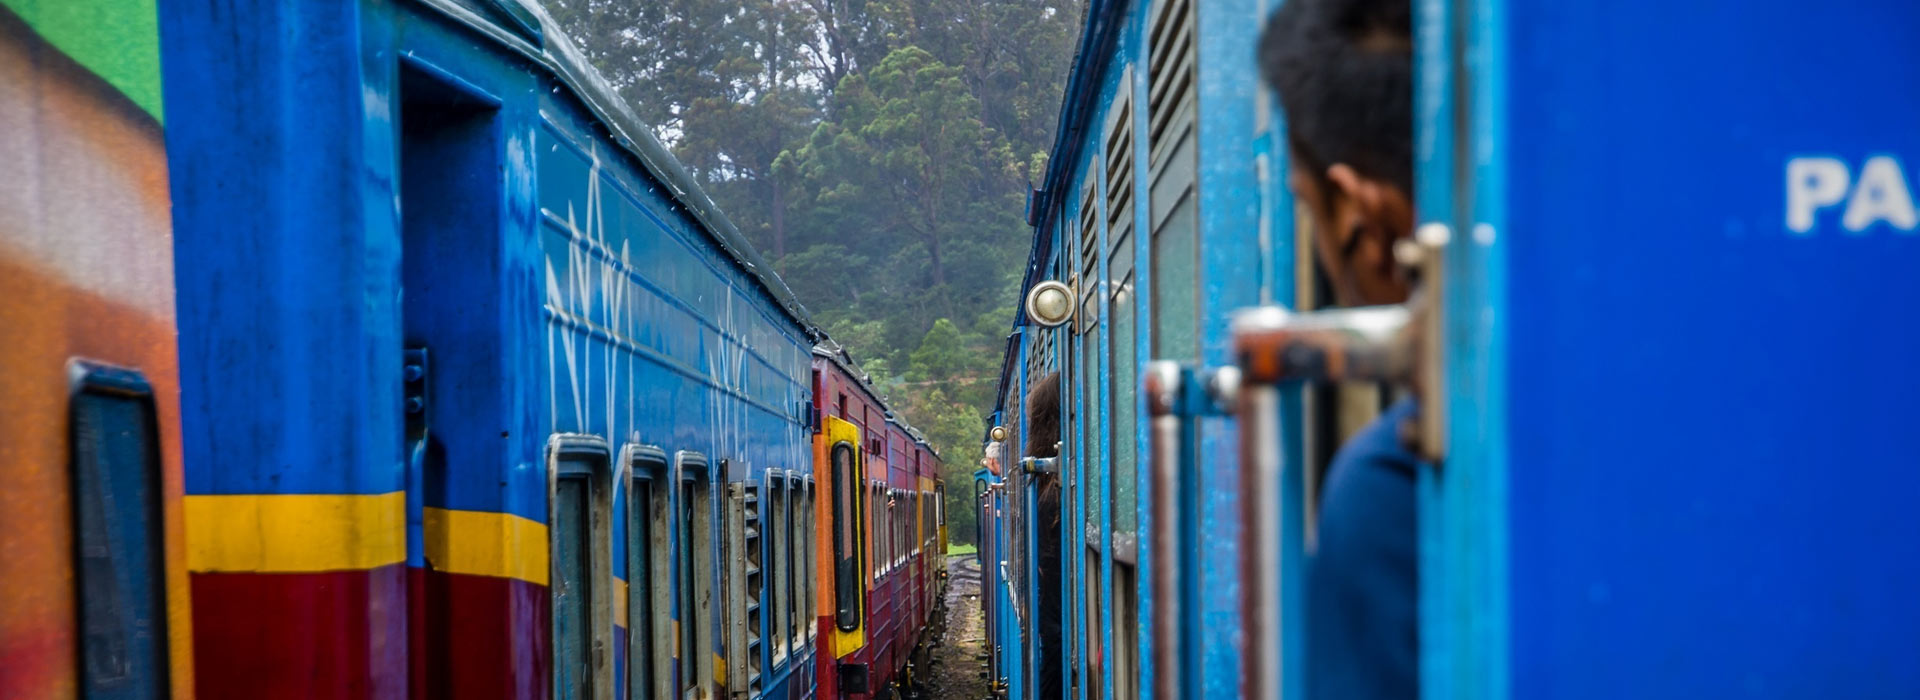 The_awesome_trains_of_Sri_Lanka